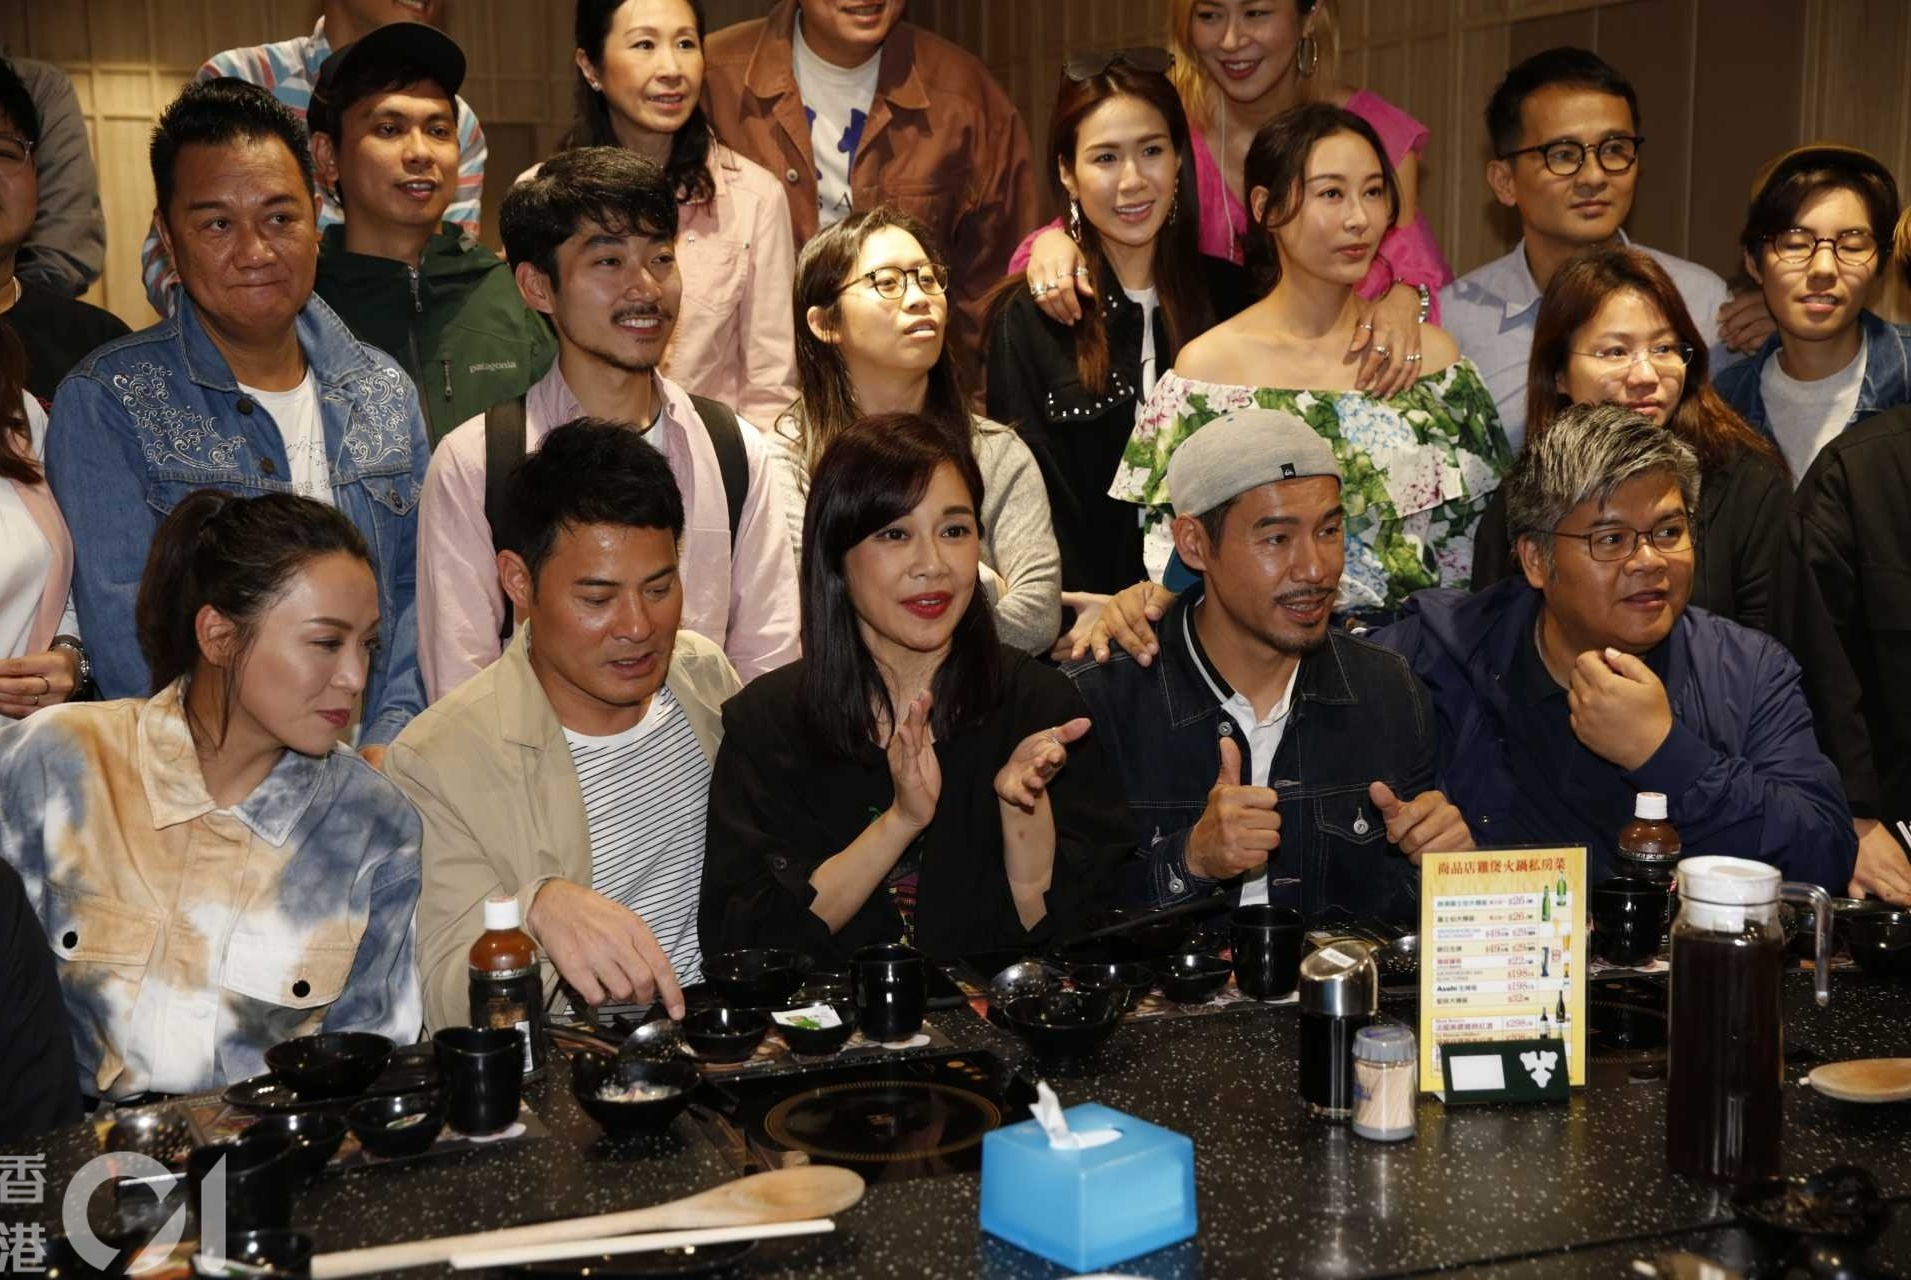 TVB当家花旦对昔日娘家裁员不知情 自爆曾考虑到内地发展